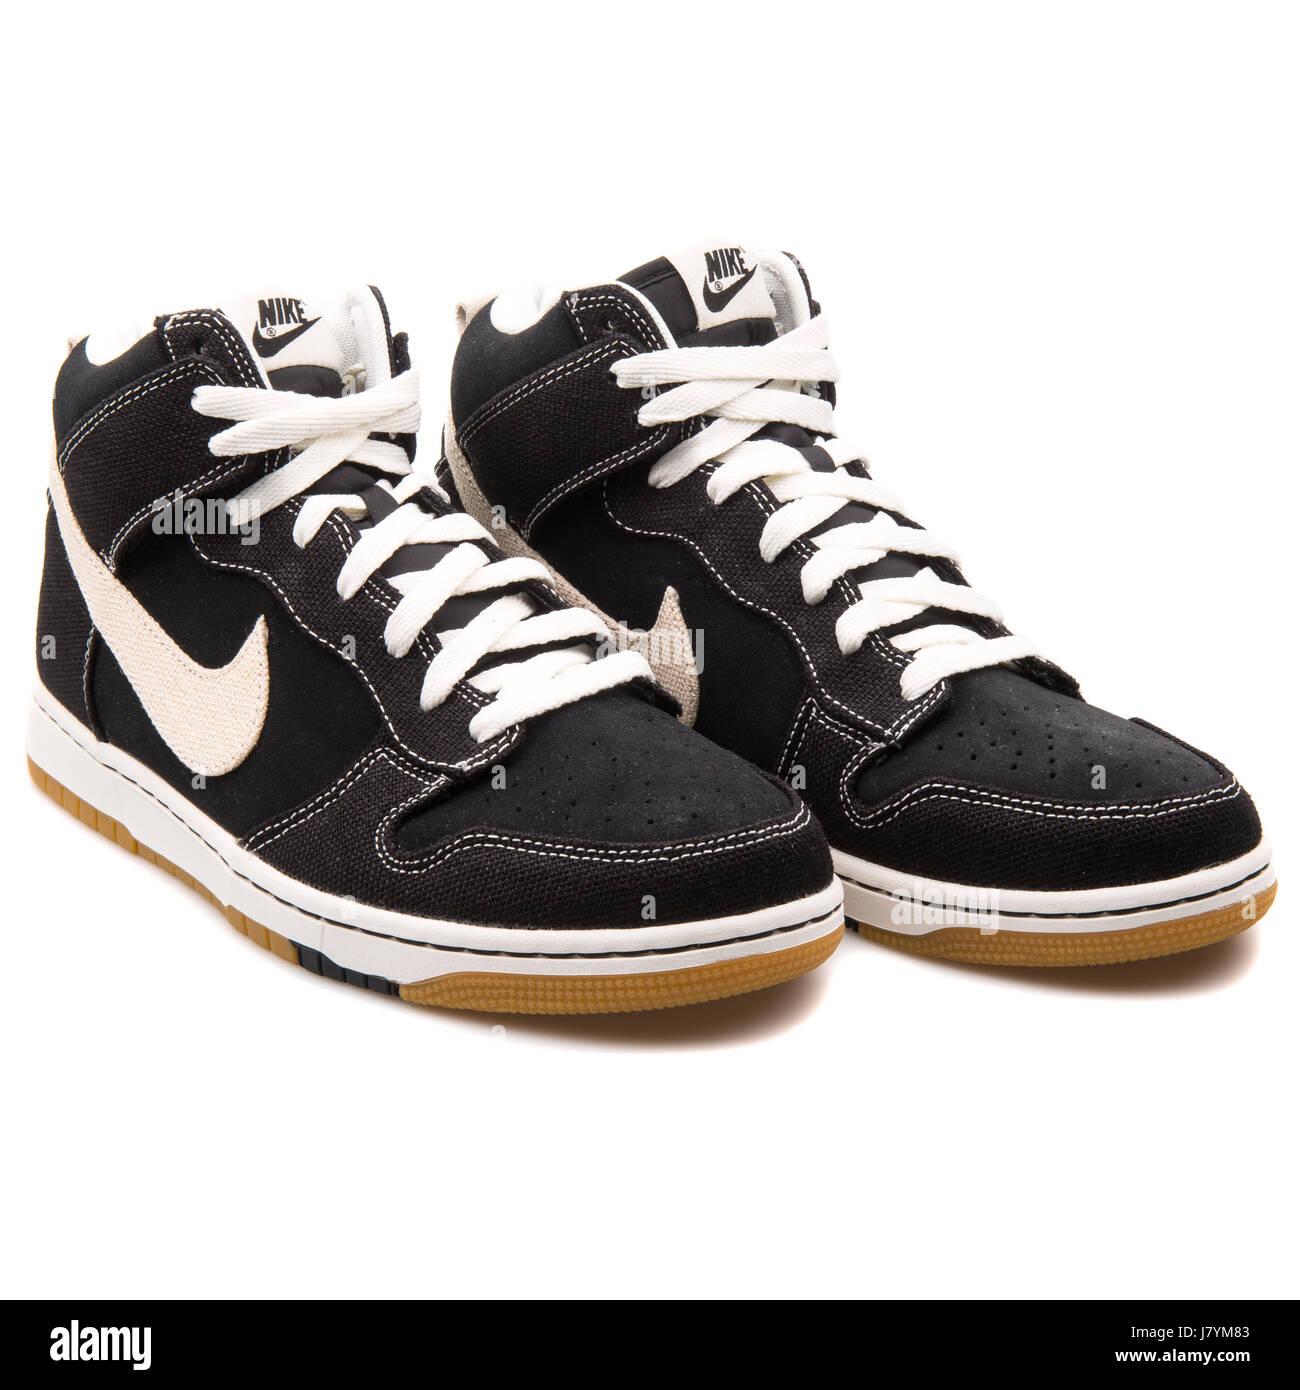 Nike Dunk CMFT Black Men's Basketball Sneakers - 705434-002 - Stock Image